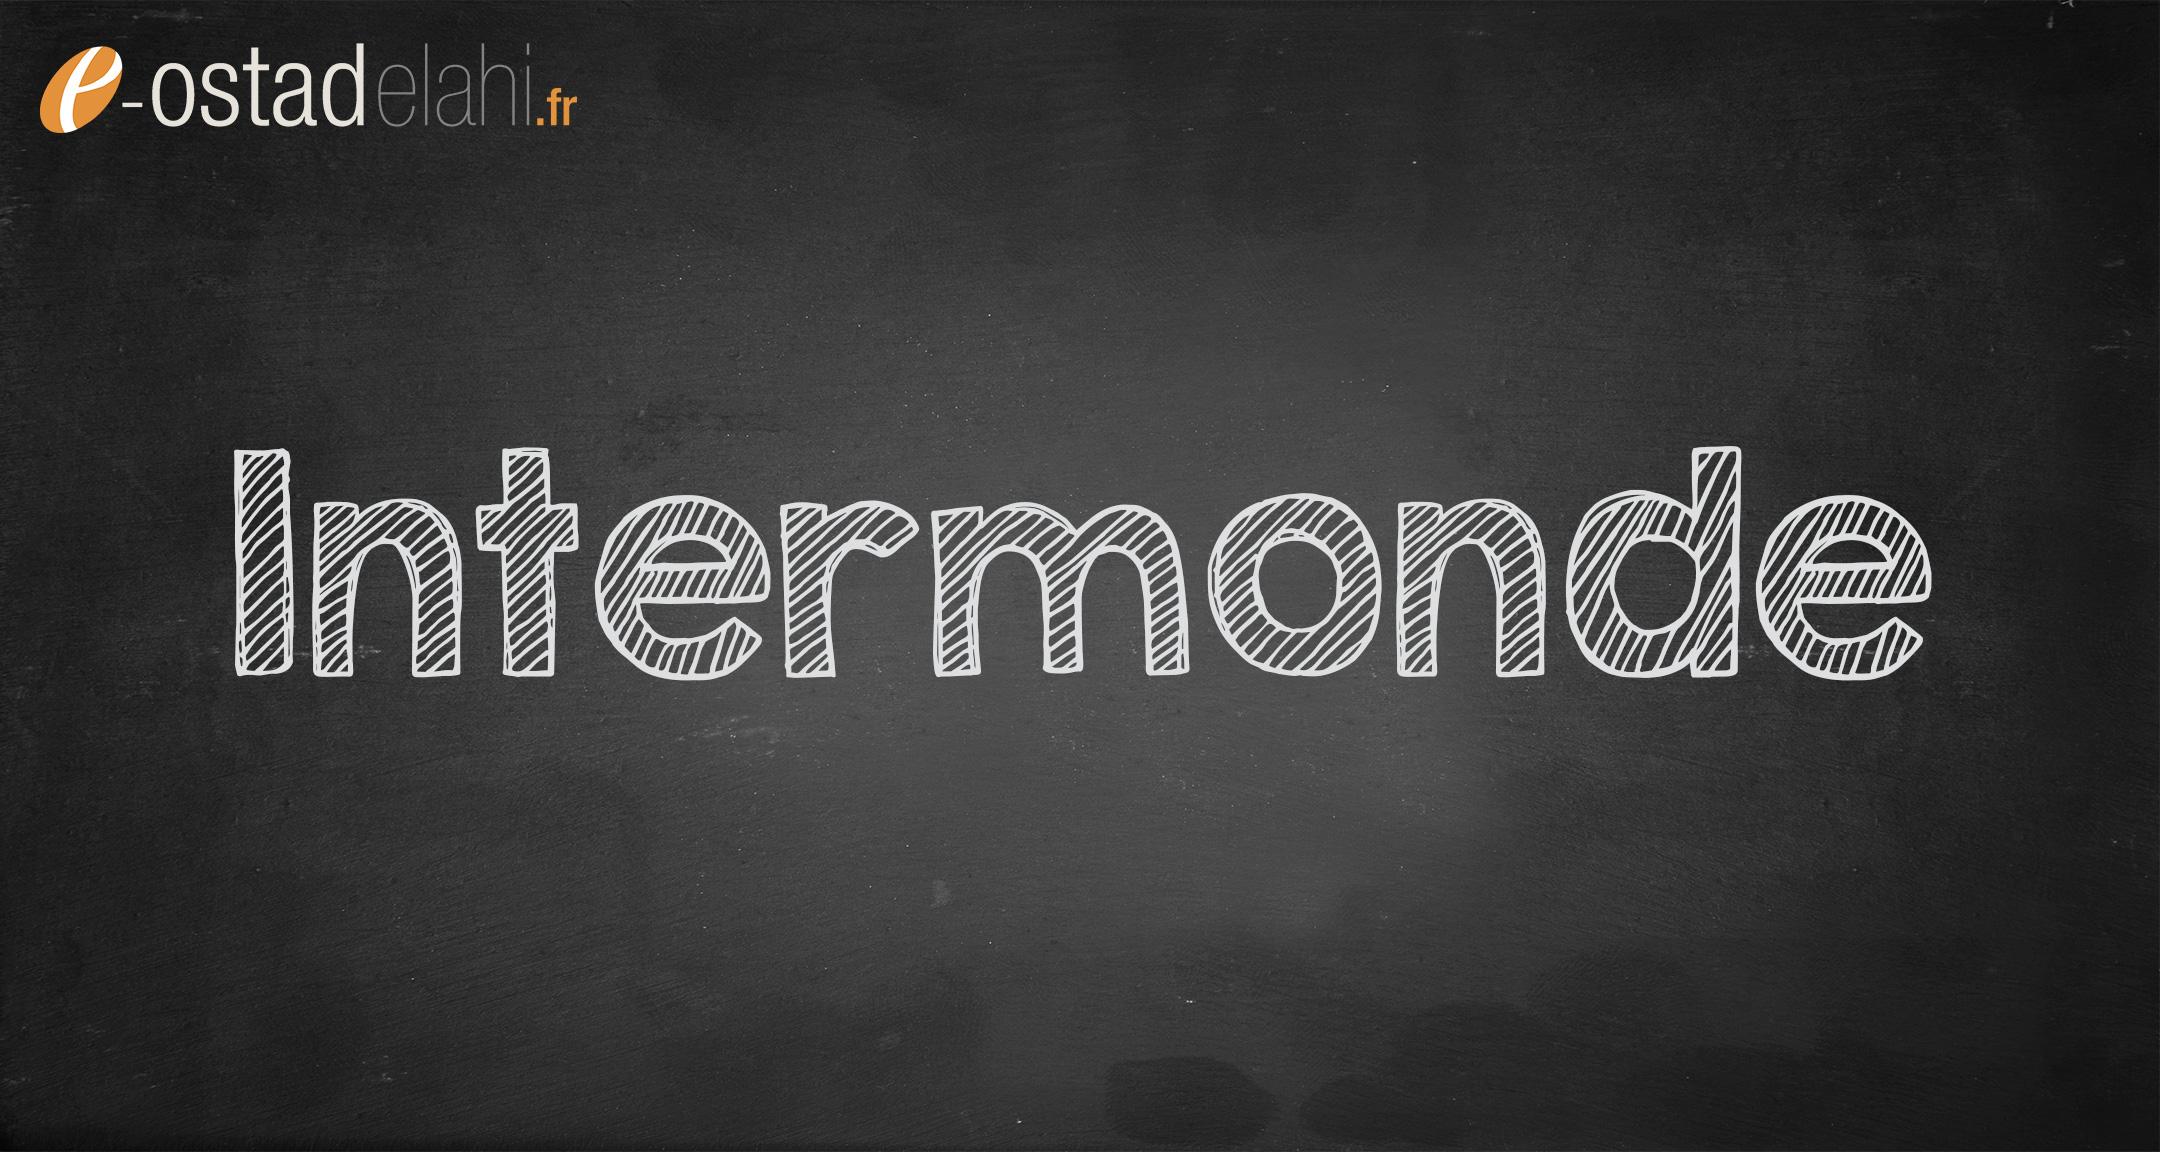 intermonde